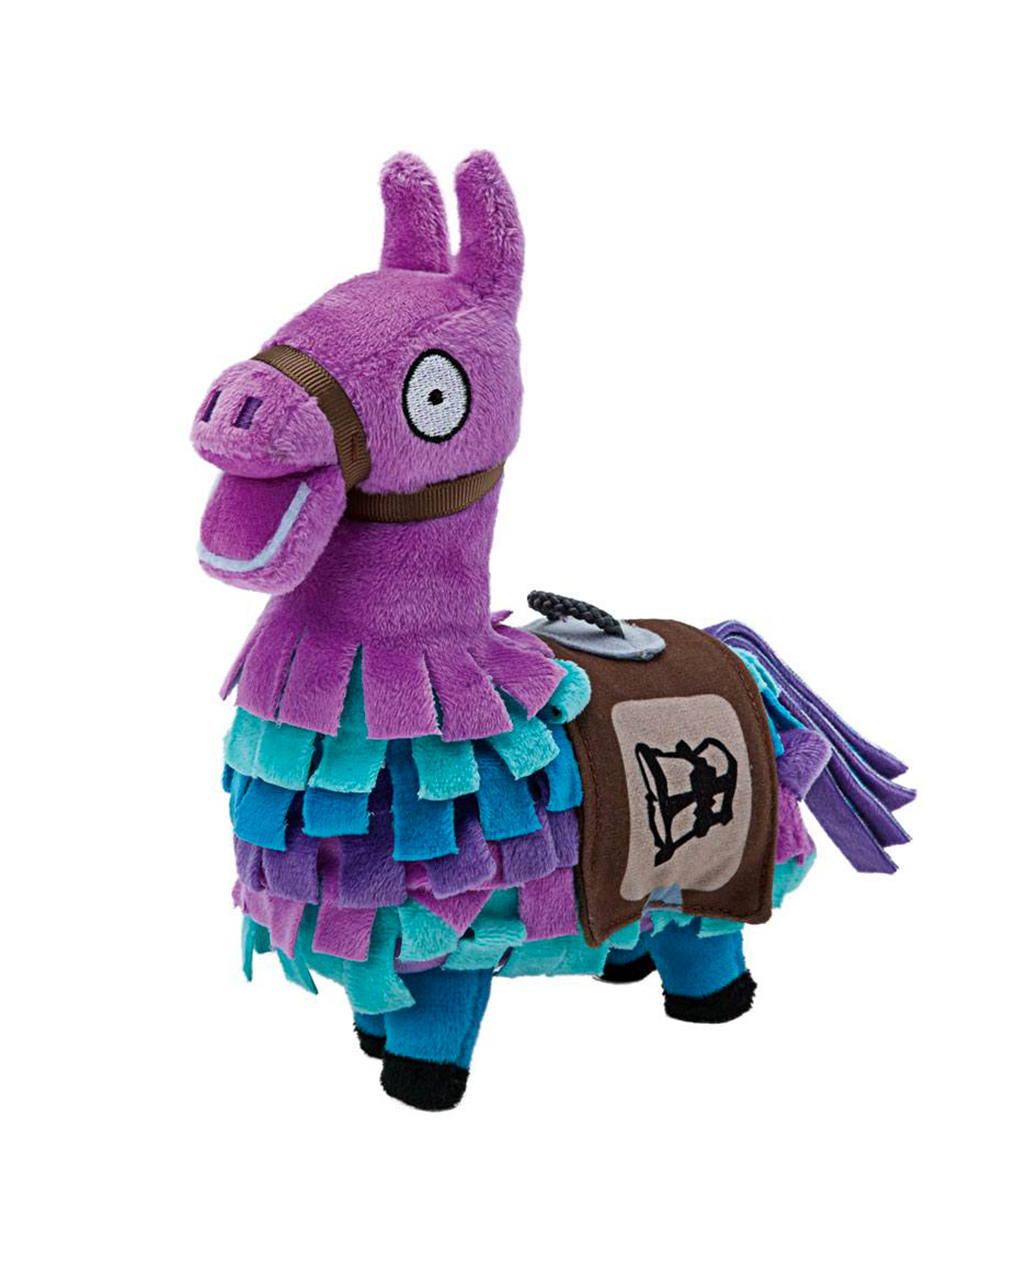 Fortnite - Llama Loot Stuffed Animal